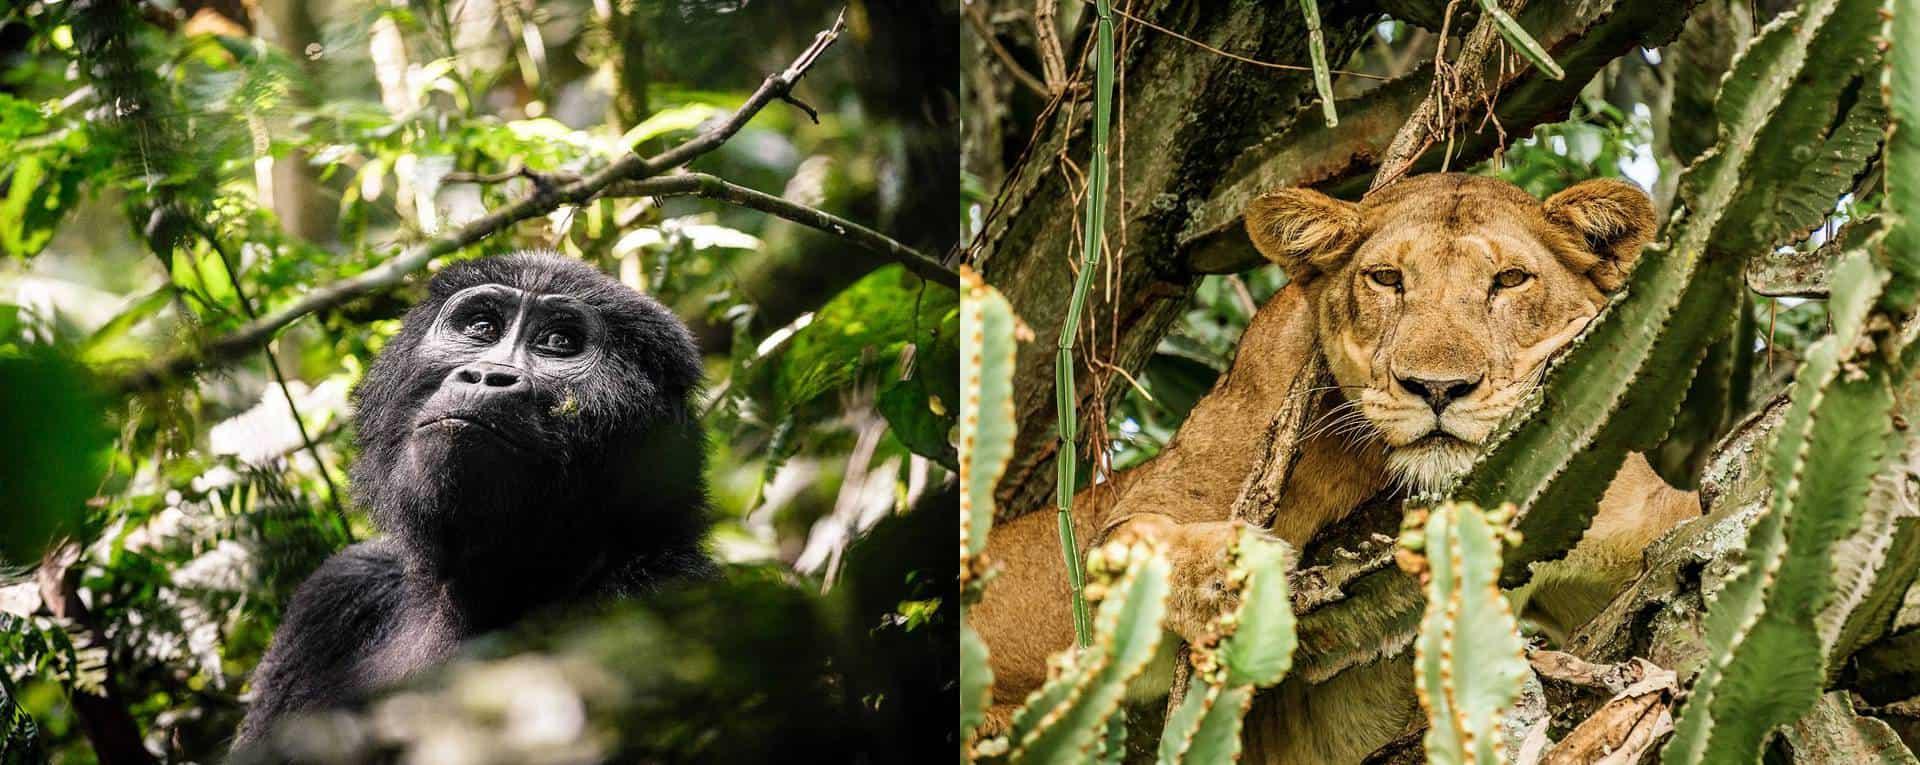 Photo Safaris Trip Planning Guide For Uganda